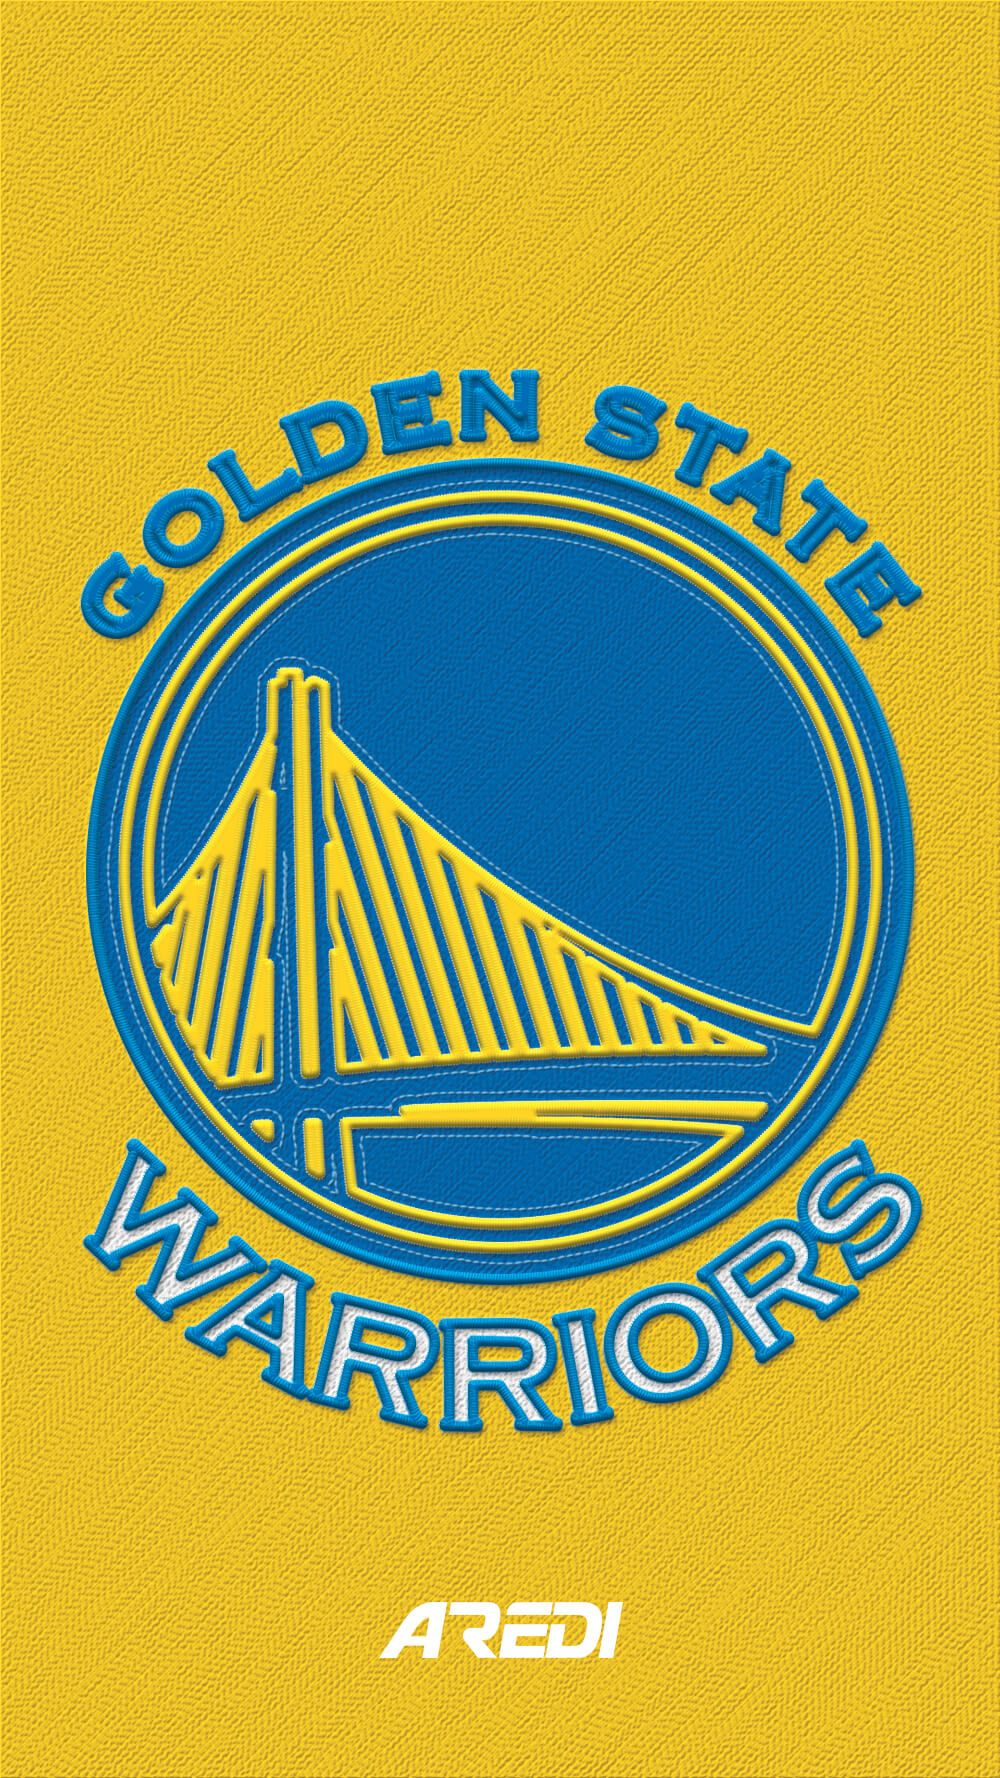 Aredi Infografika Golden State Warriors Wallpaper Golden State Warriors Logo Nba Golden State Warriors